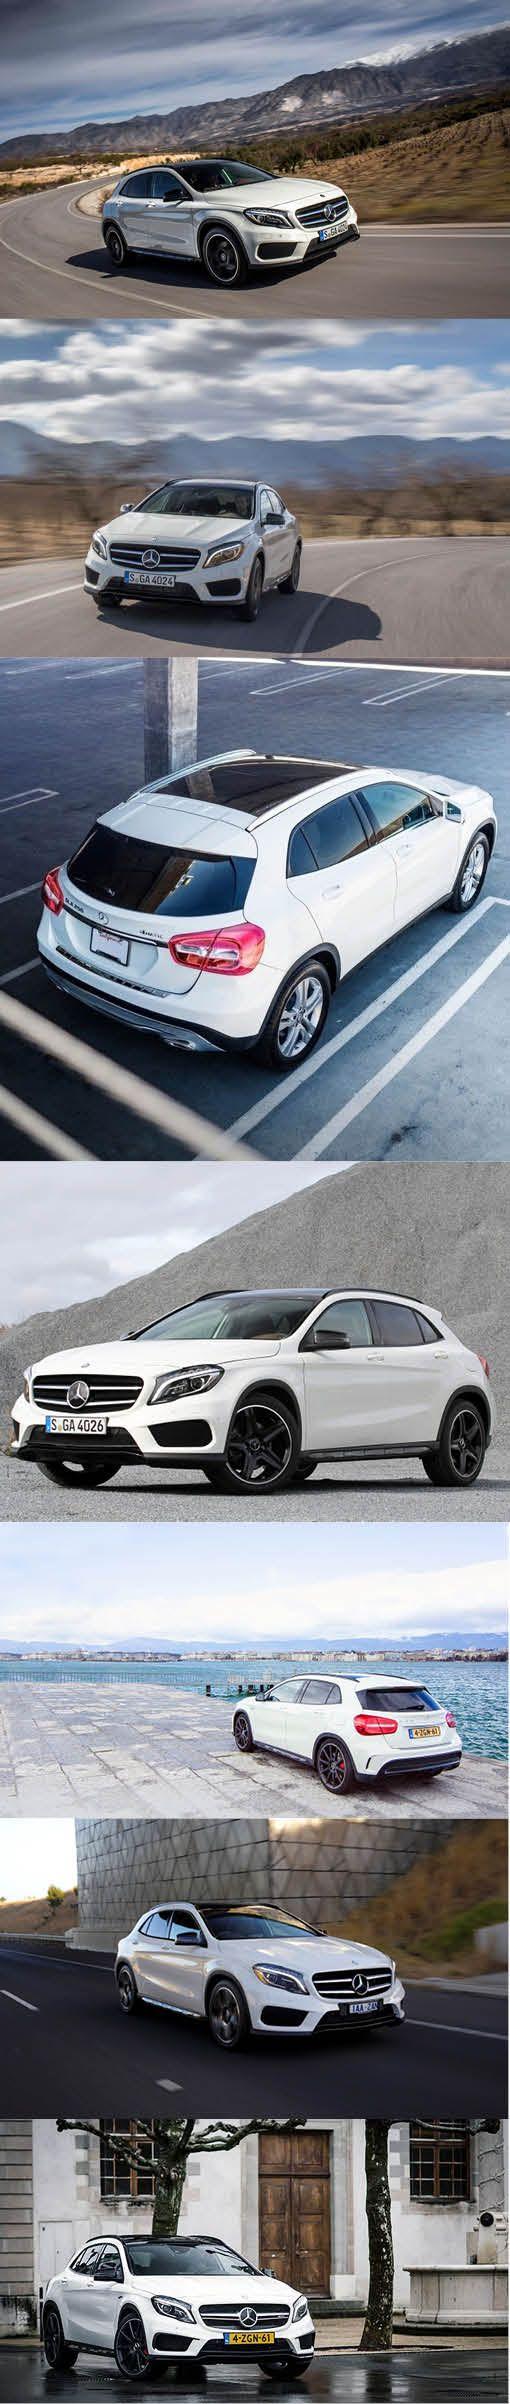 2013 Mercedes-Benz GLA / Germany / white